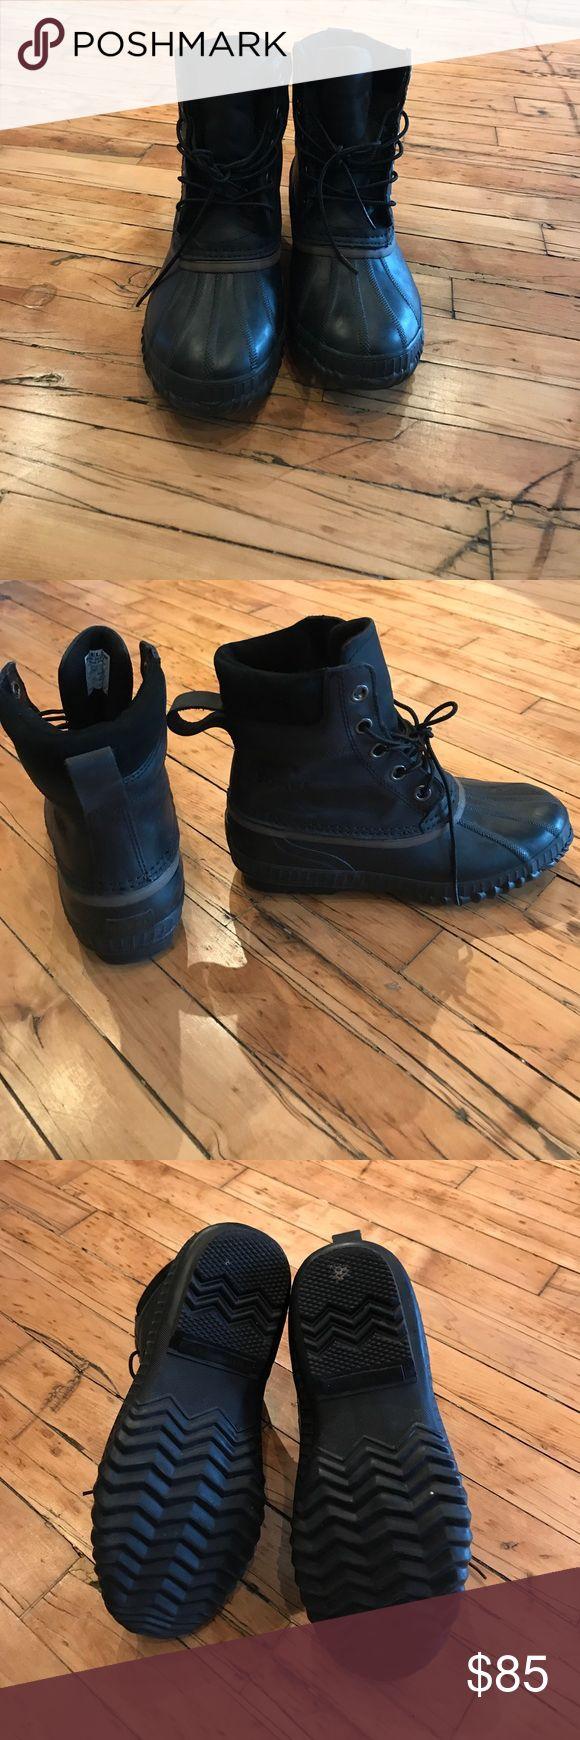 Sorel Boots Men's Cheyenne ace full grain leather boot. Casual, heavy rain, light snow Sorel Shoes Rain & Snow Boots